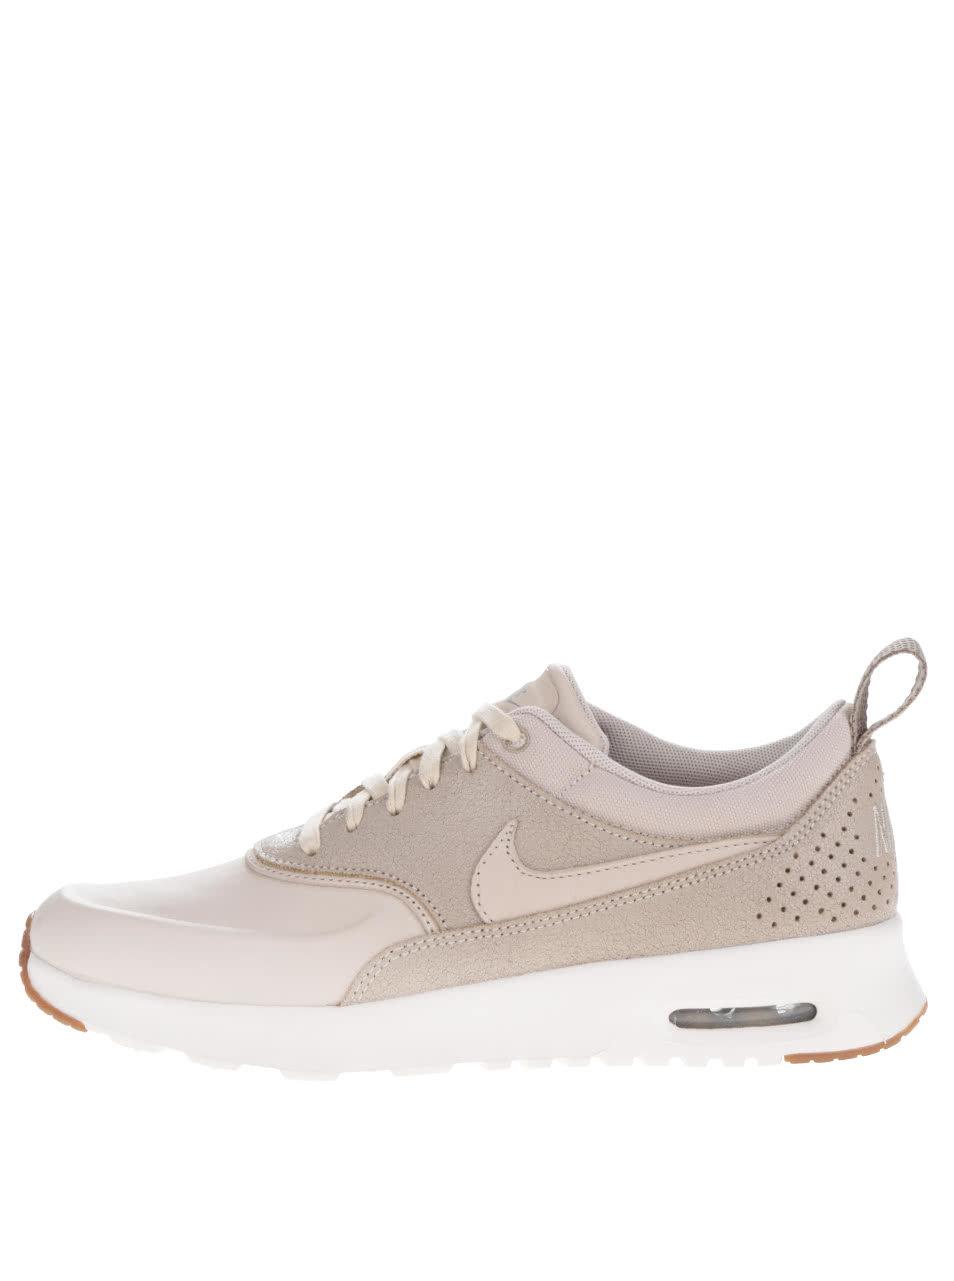 5d6a8dea174b6 Béžové dámske kožené tenisky Nike Air Max Thea Premium | ZOOT.sk